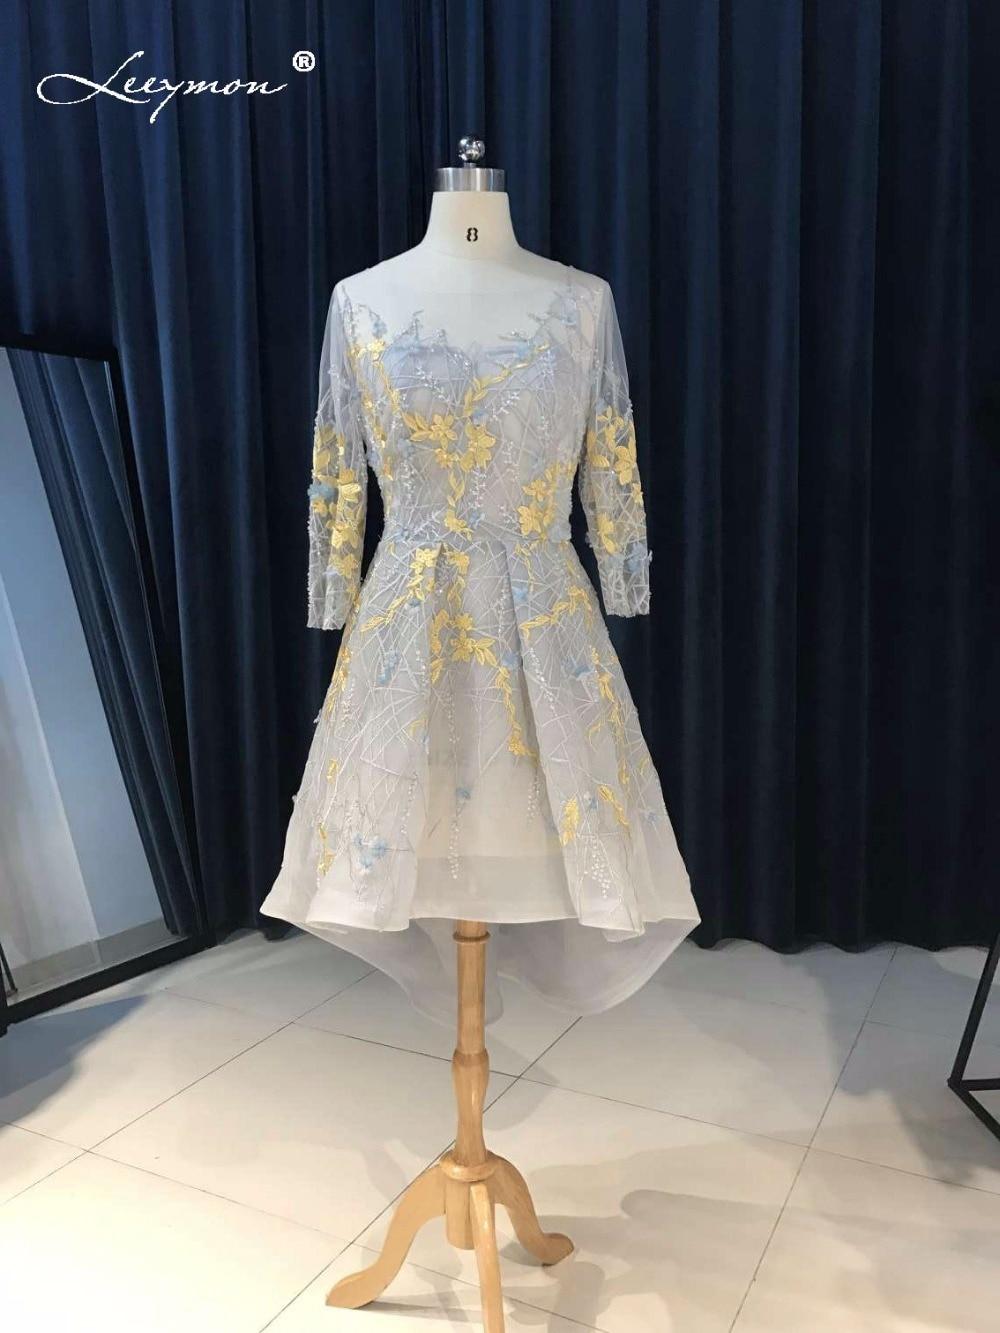 Novi vrući seksi Crystal koktel haljina 2017 Backless čipka kratki - Haljina za posebne prigode - Foto 3